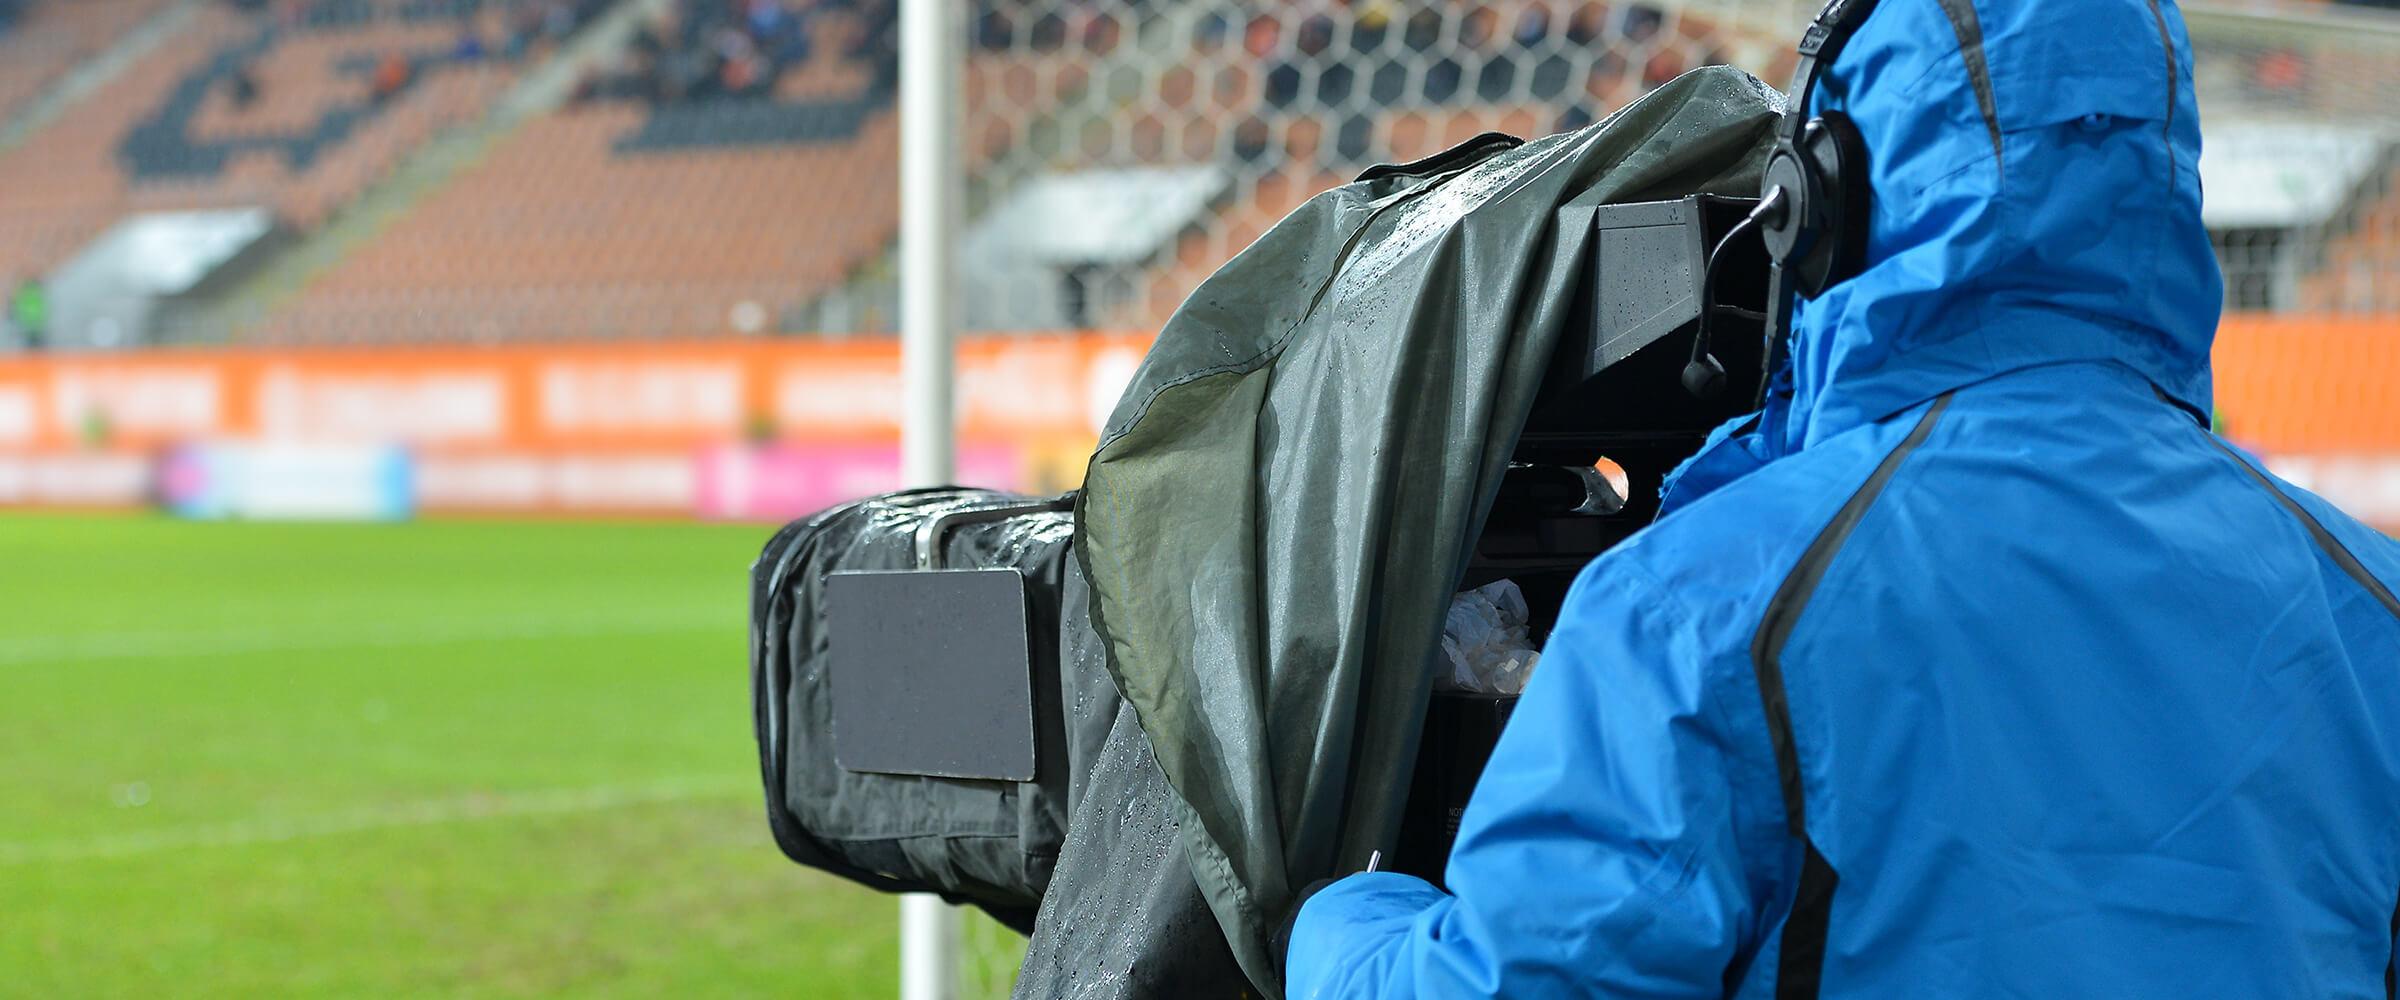 Camera operator in an empty stadium